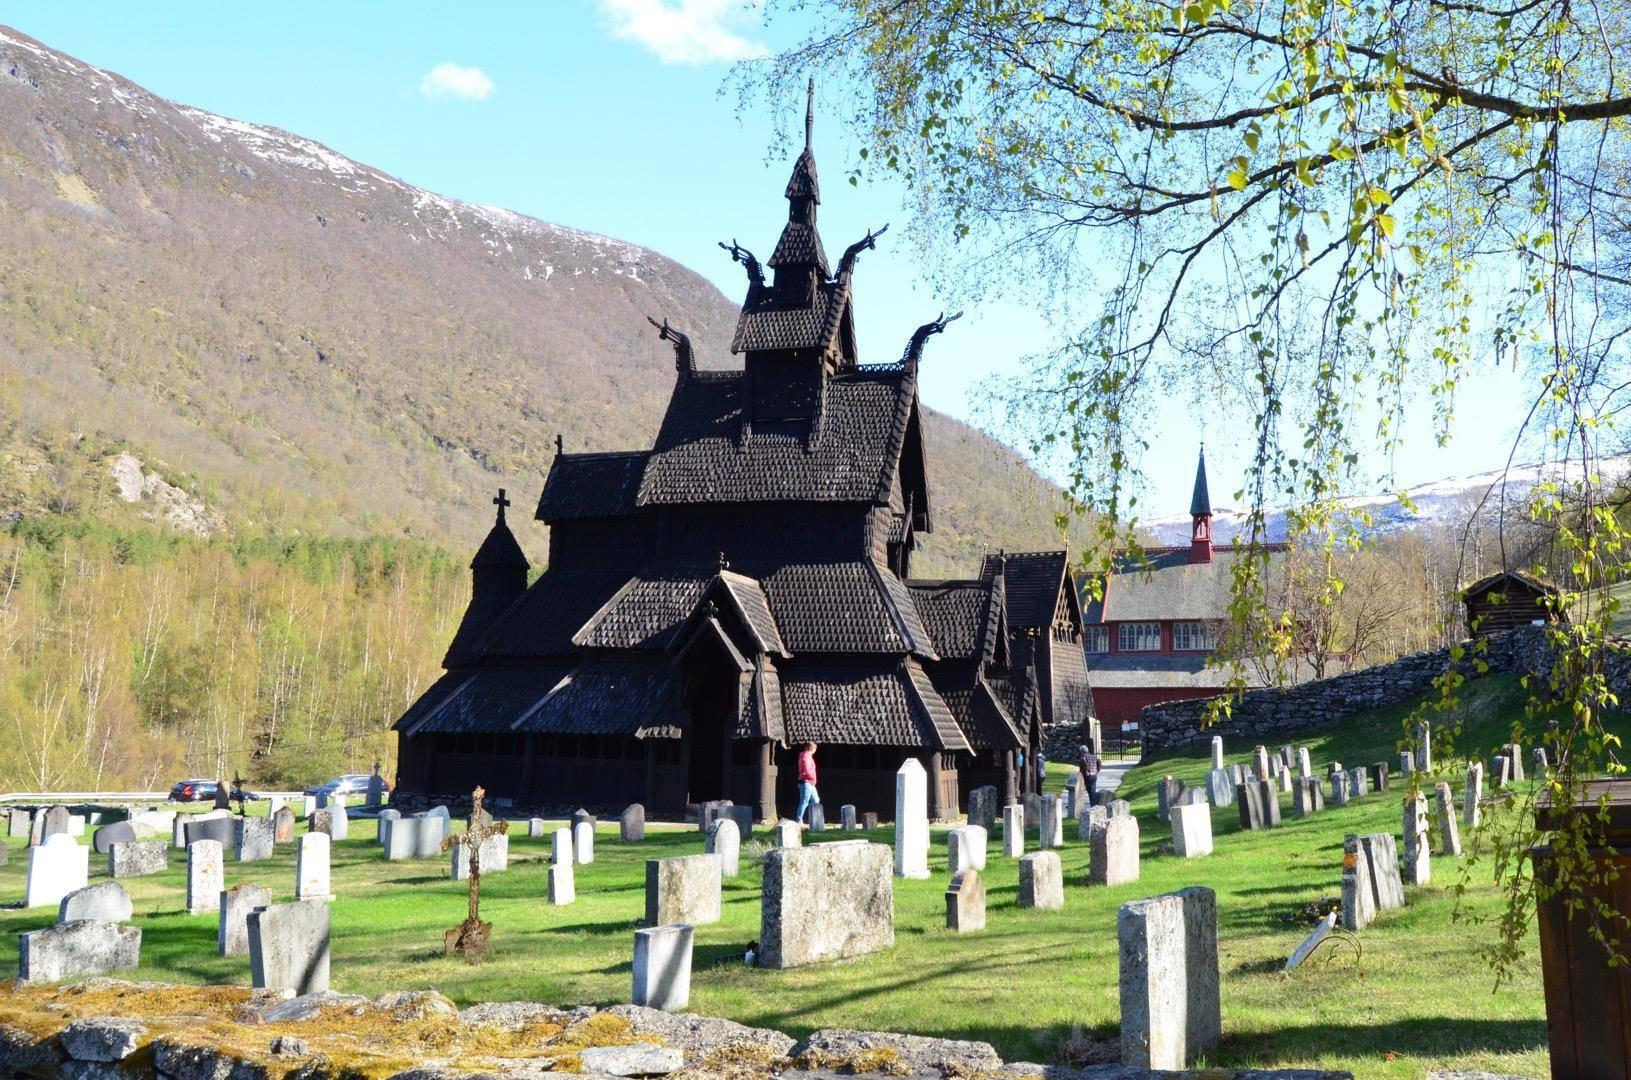 Crkva iz 1180. napravljena je od drveta bez čavala ili ljepila